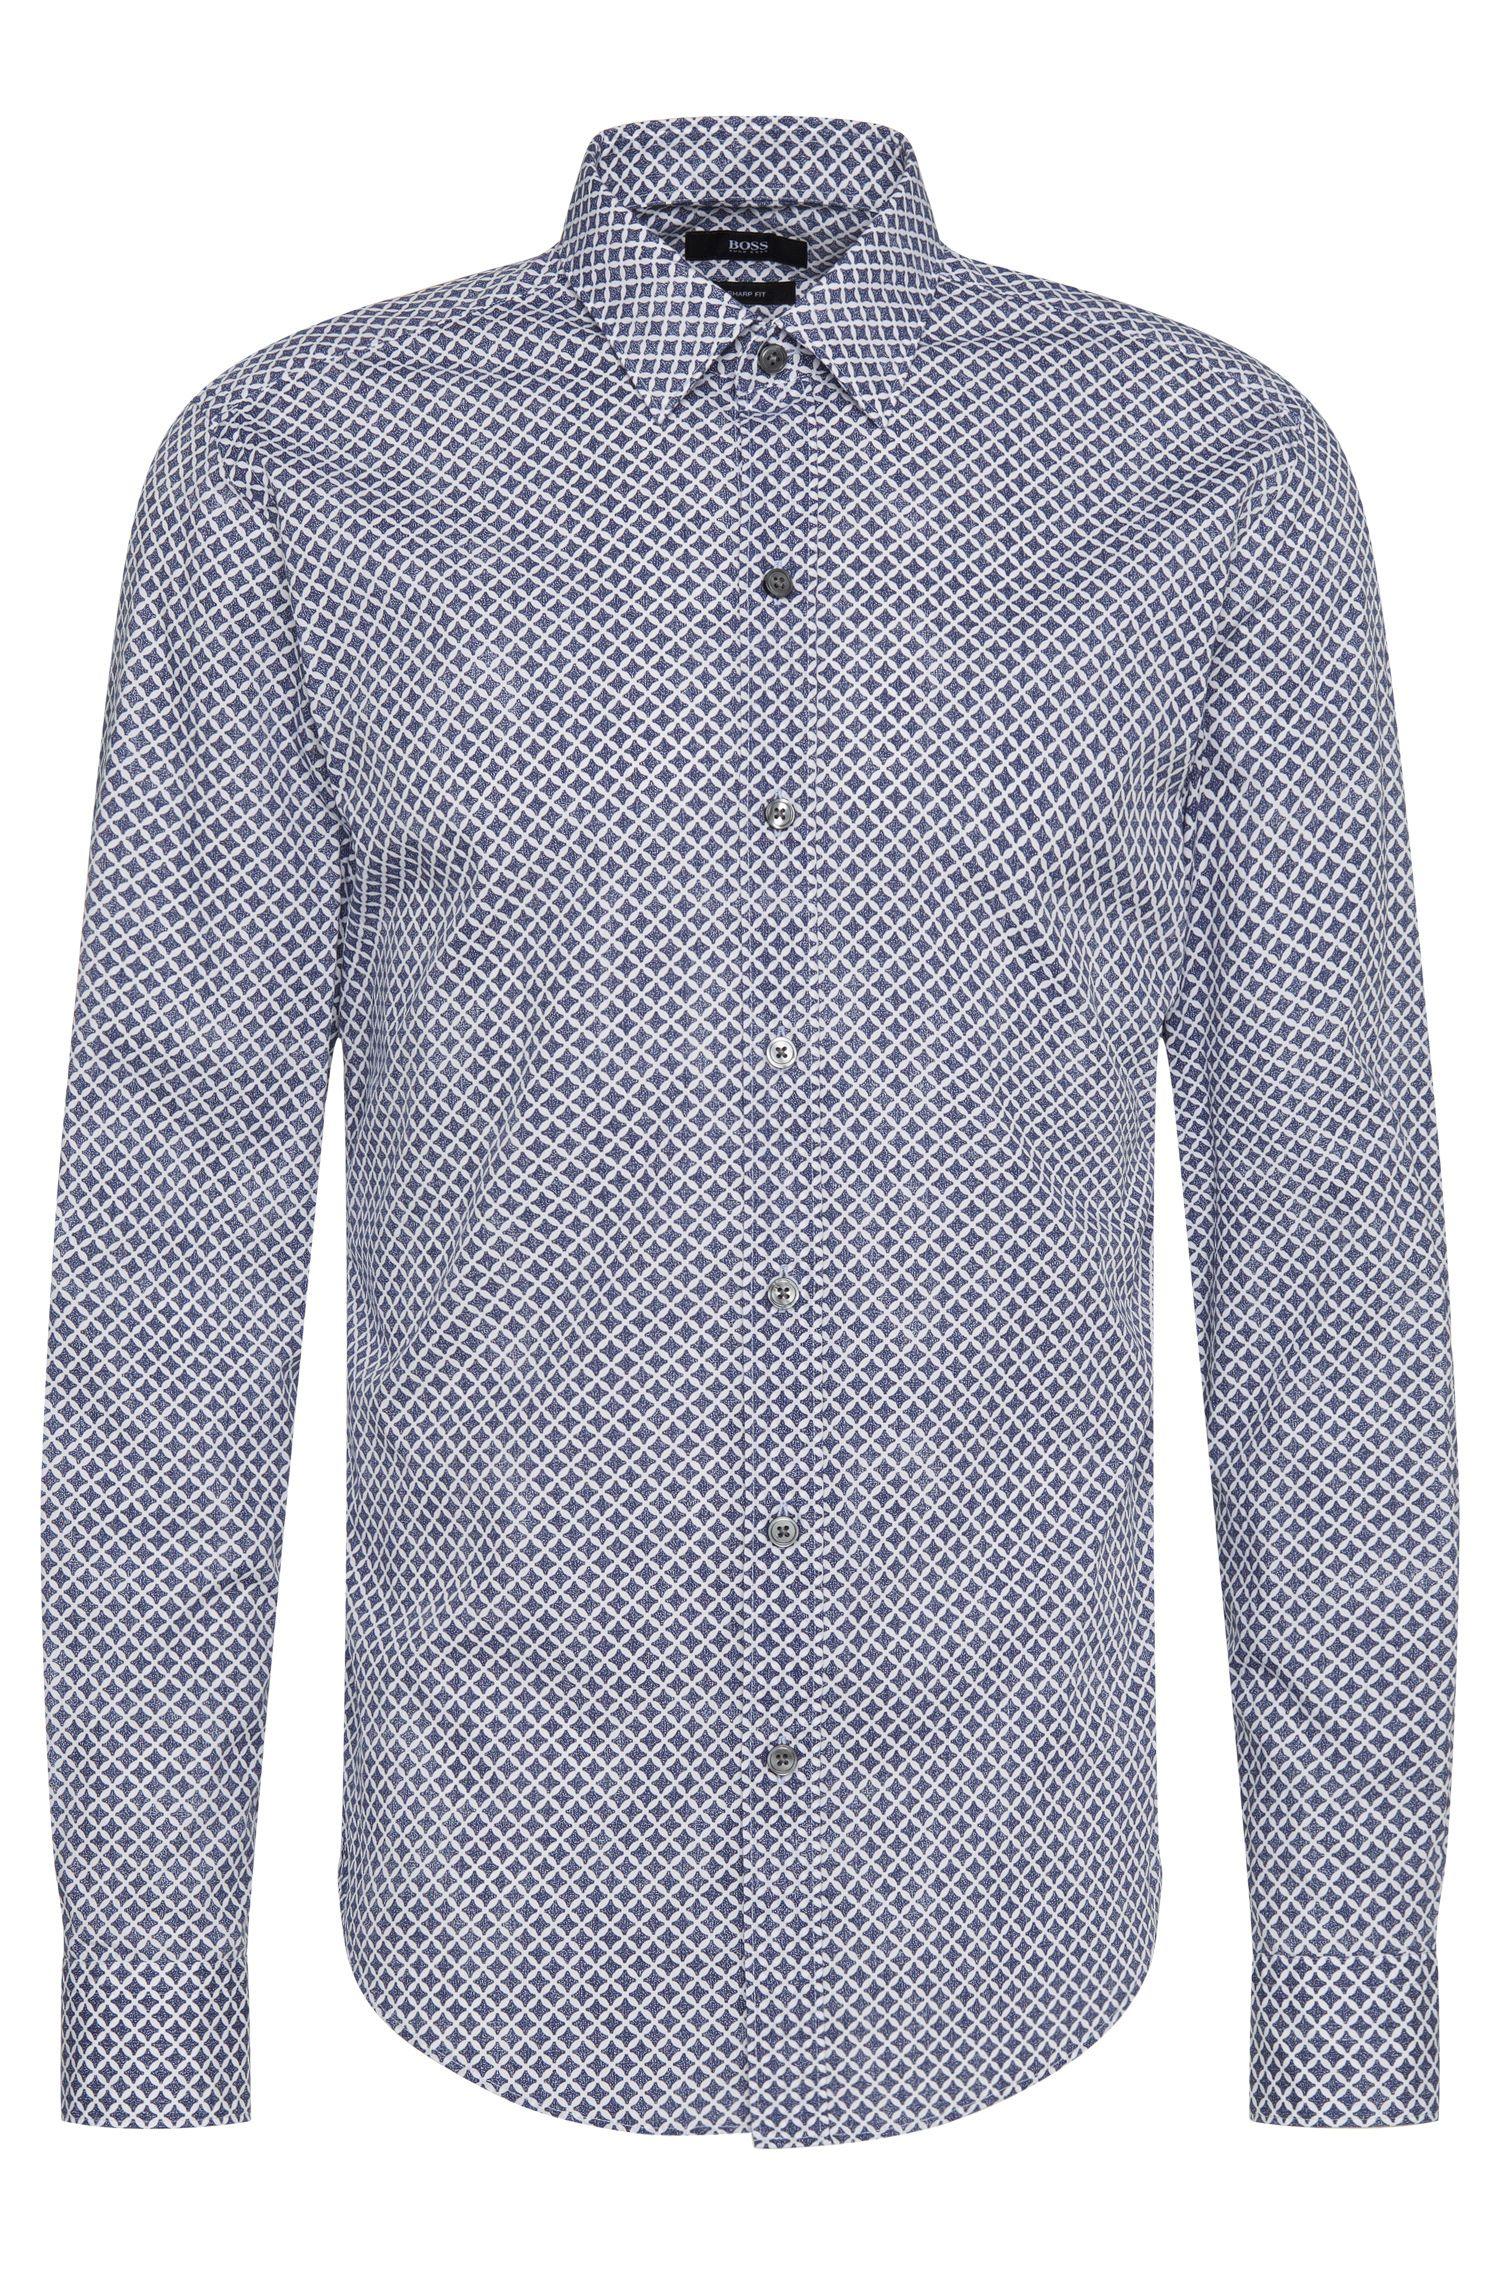 'Robbie' | Slim Fit, Italian Cotton Button Down Shirt